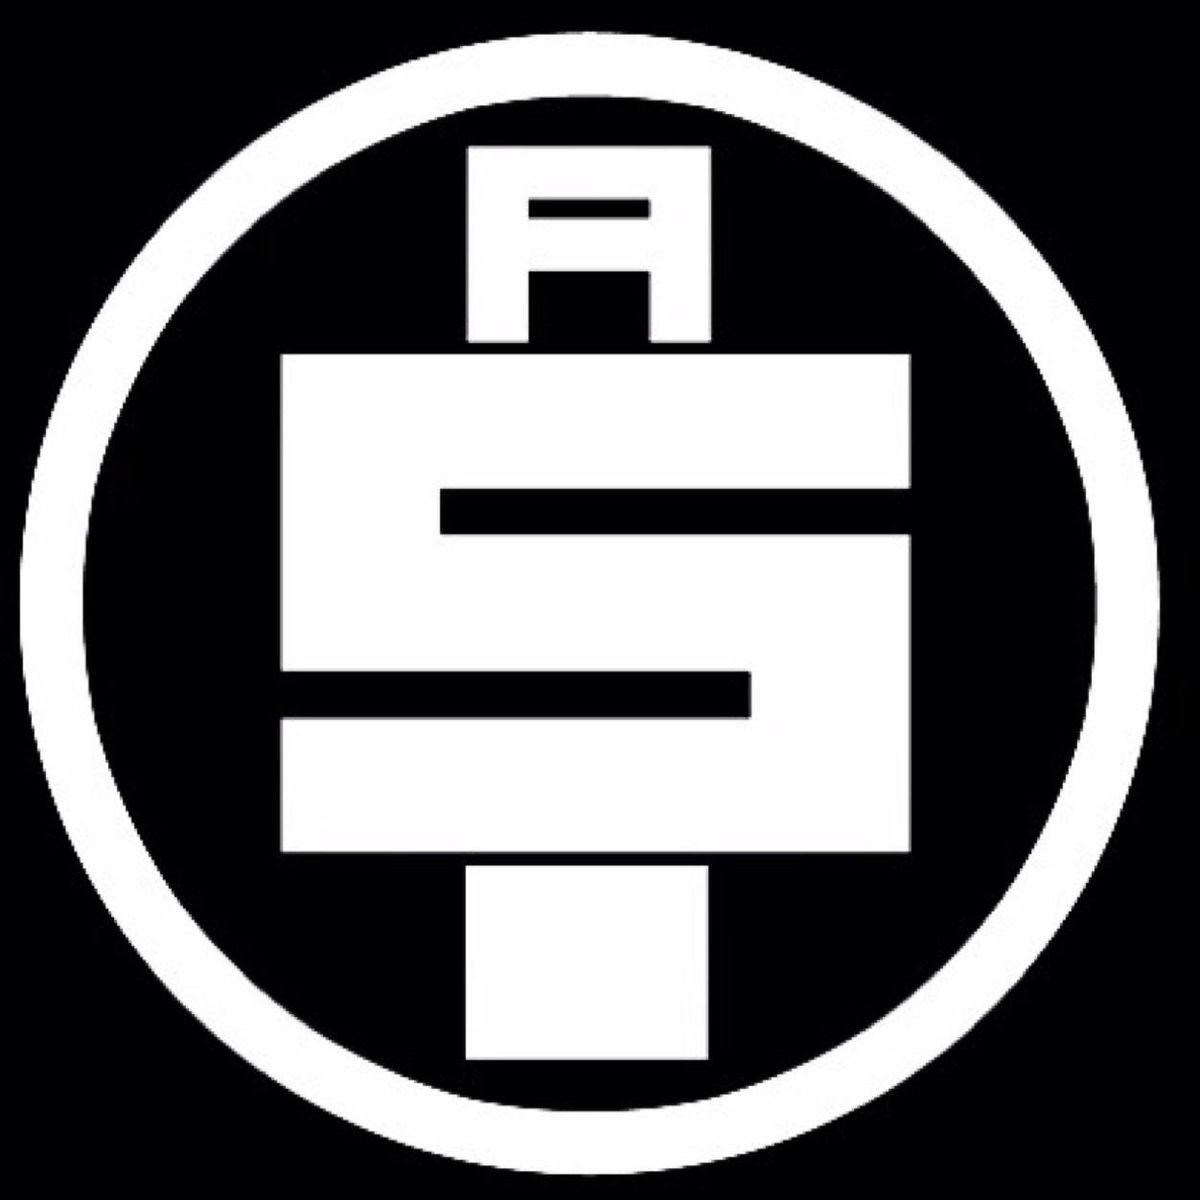 All money in Logos.